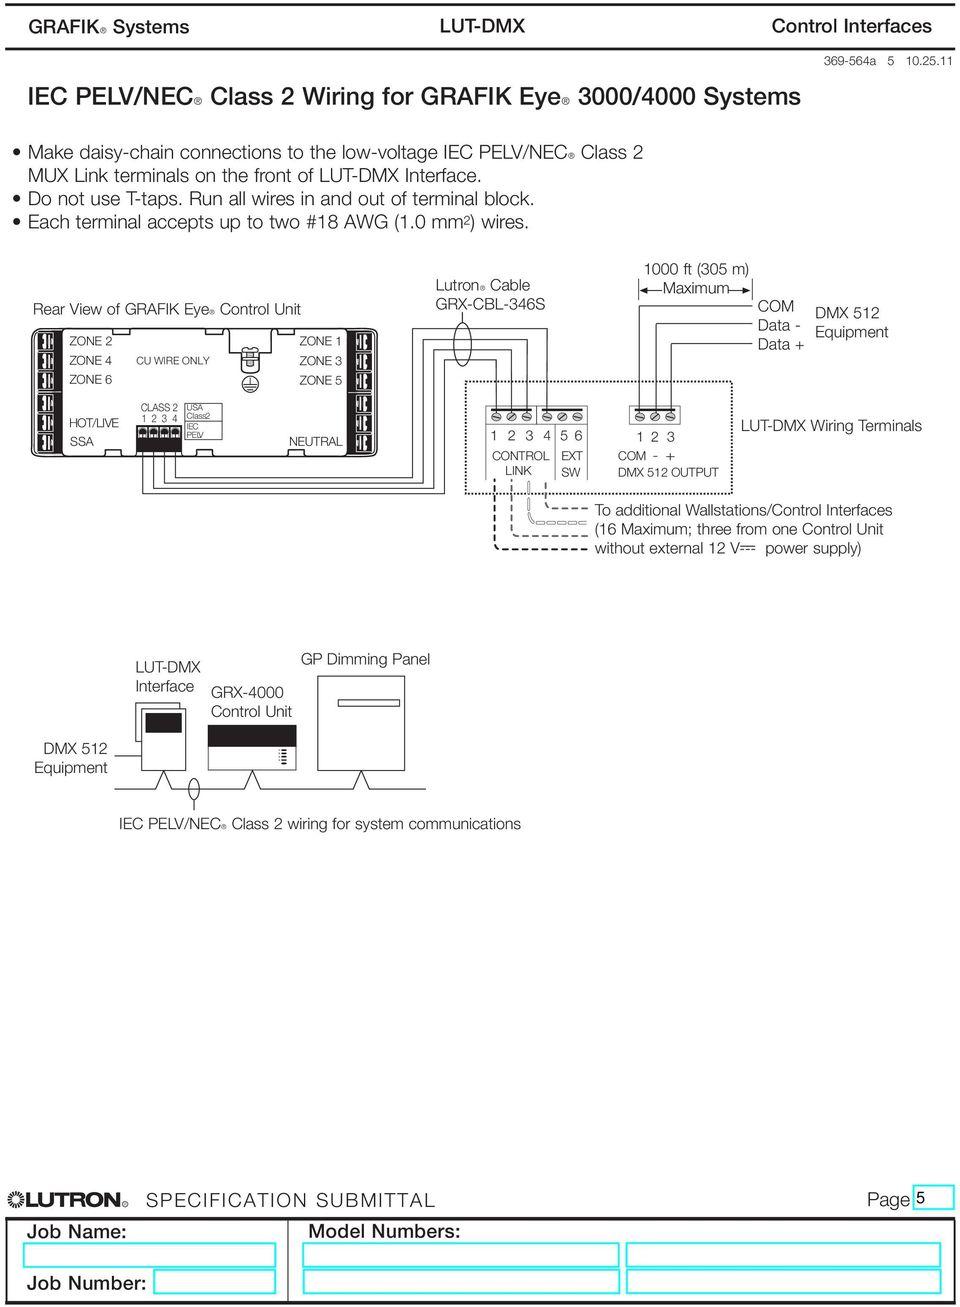 medium resolution of rear view of grafik eyer control unit zone 2 zone 1 zone 4 cu wire only